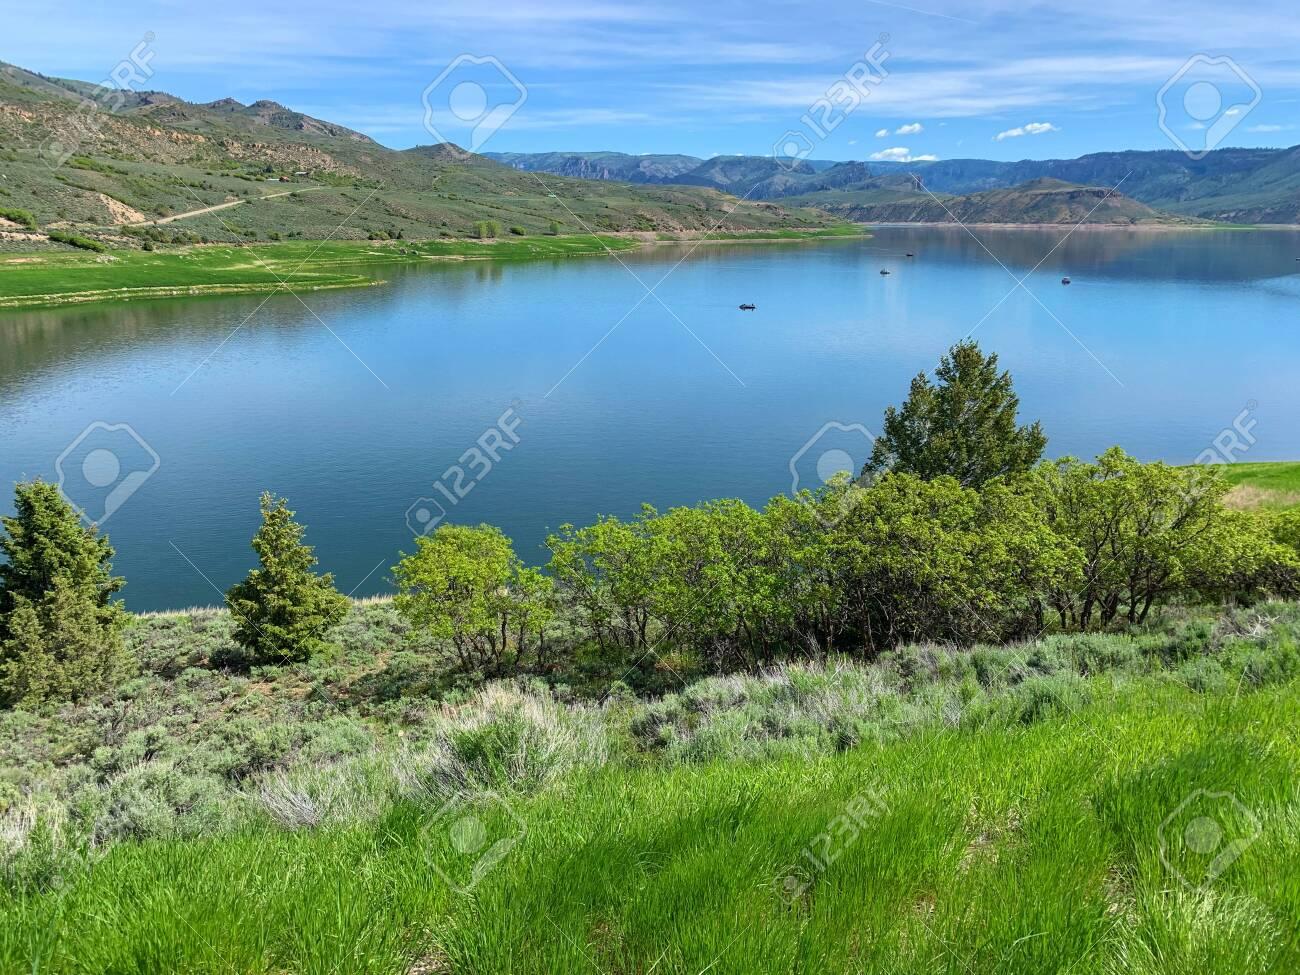 Blue Mesa Reservoir on the Gunnison River, Gunnison, Colorado - 125193121